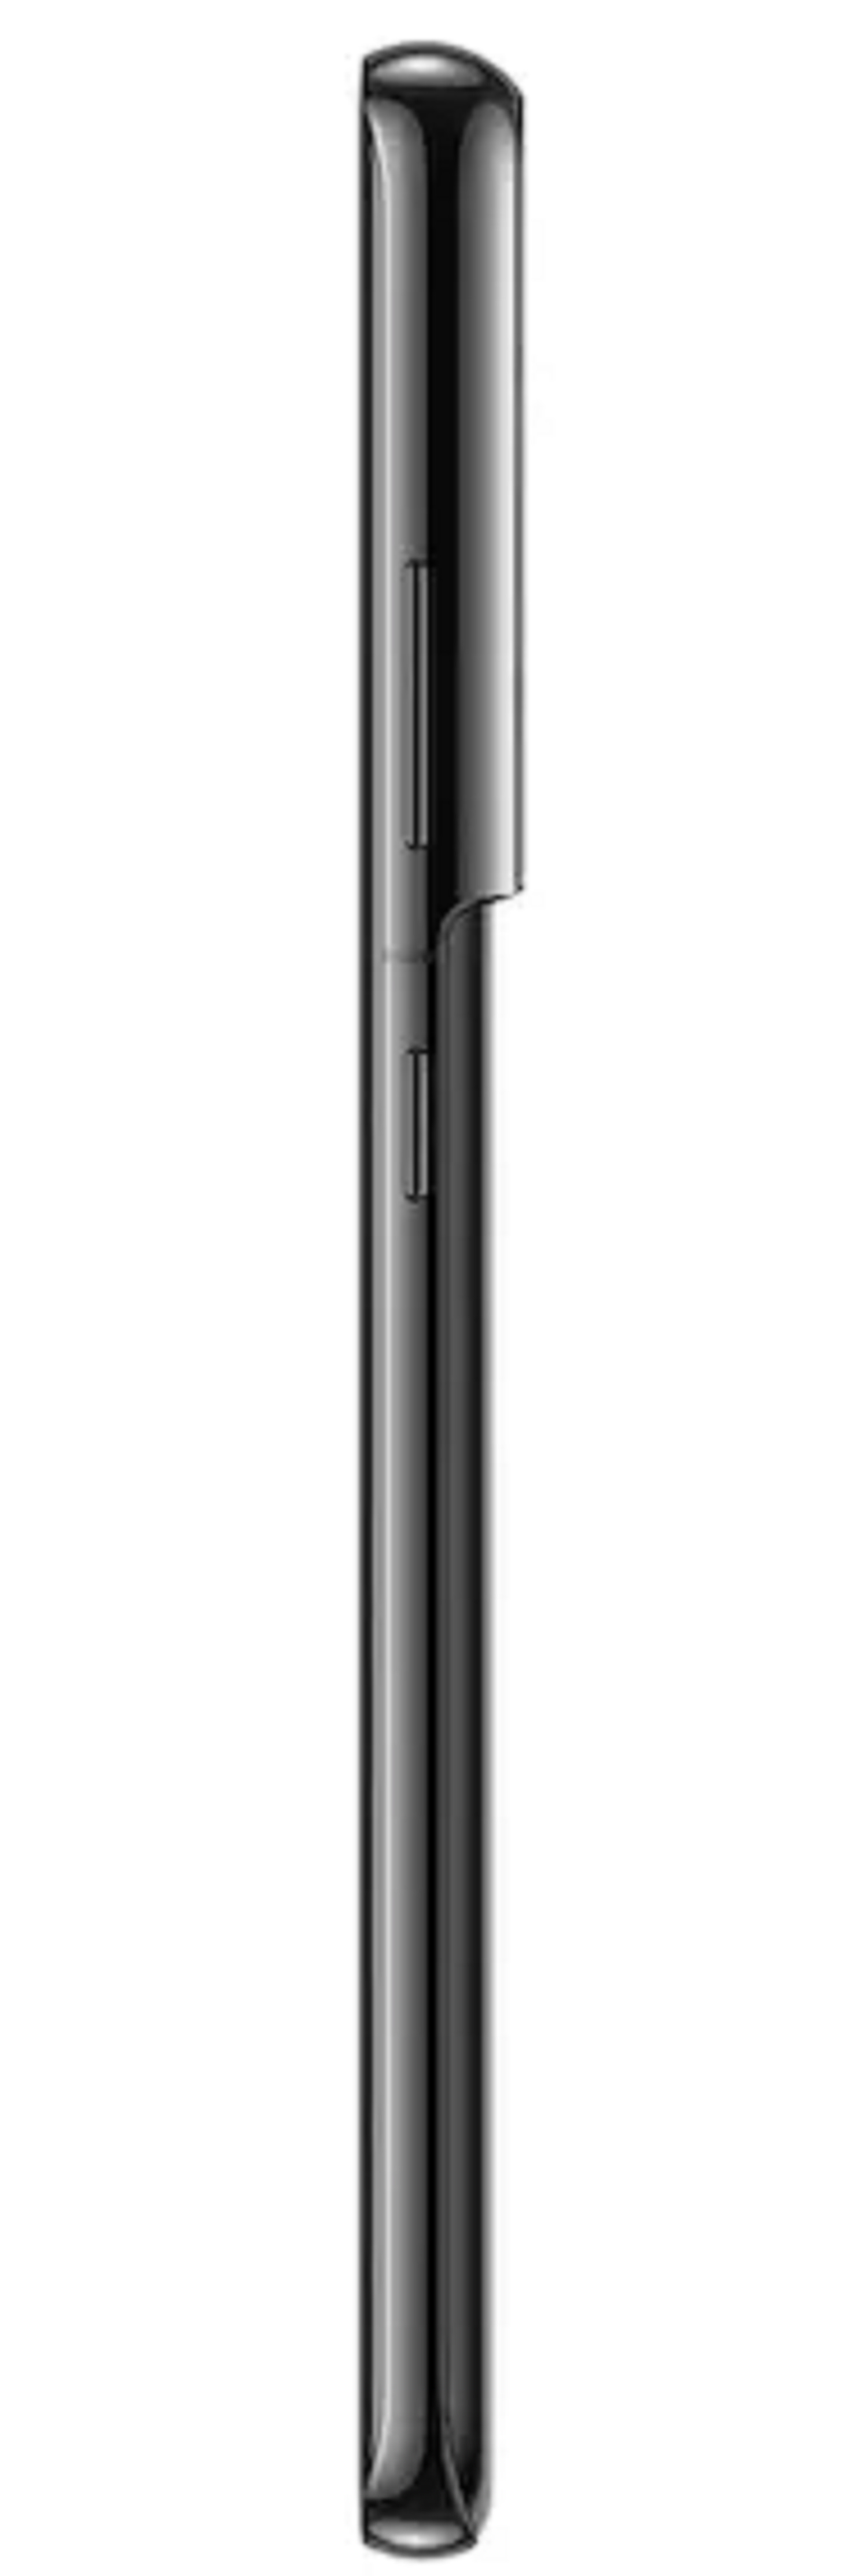 thumbnail 6 - Samsung Galaxy G998U S21 Ultra 5G 128GB Unlocked Smartphone - Excellent